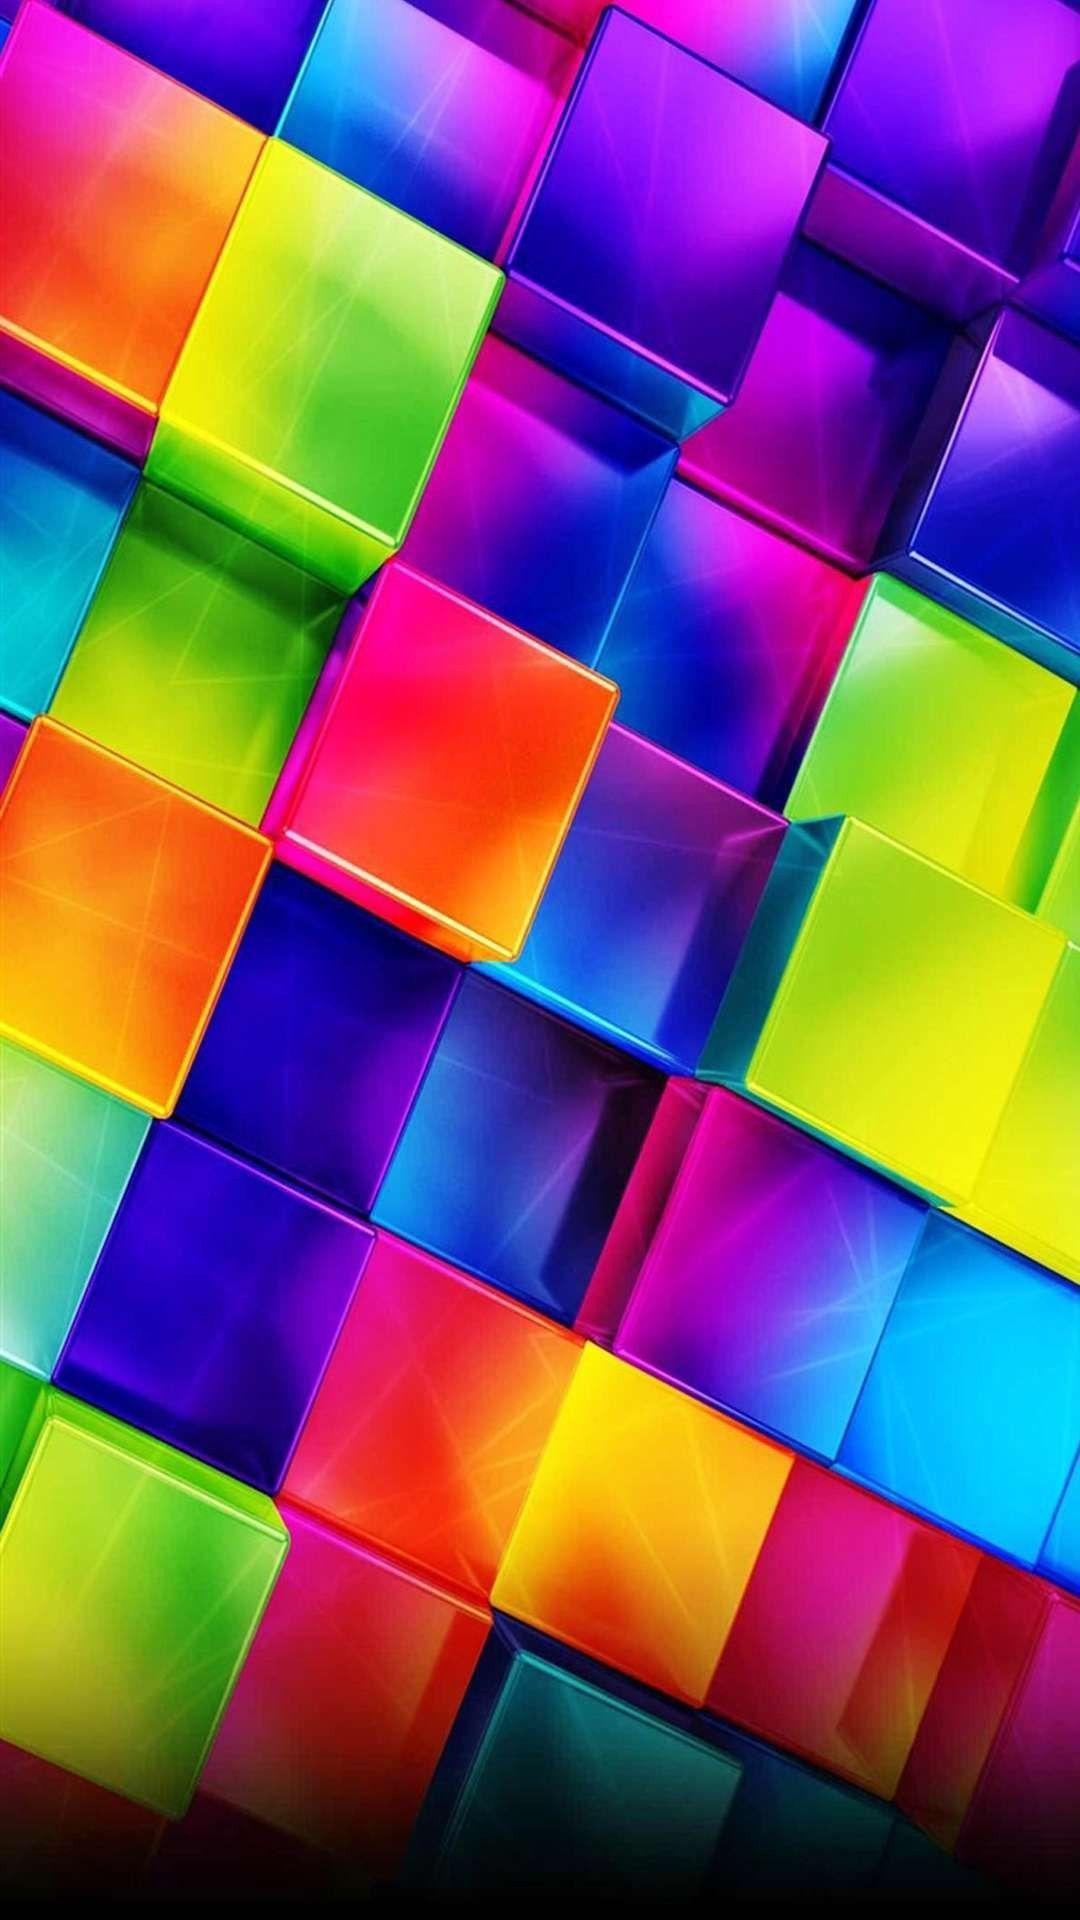 Pin by Samantha Keller on ..1 Geometric wallpaper iphone